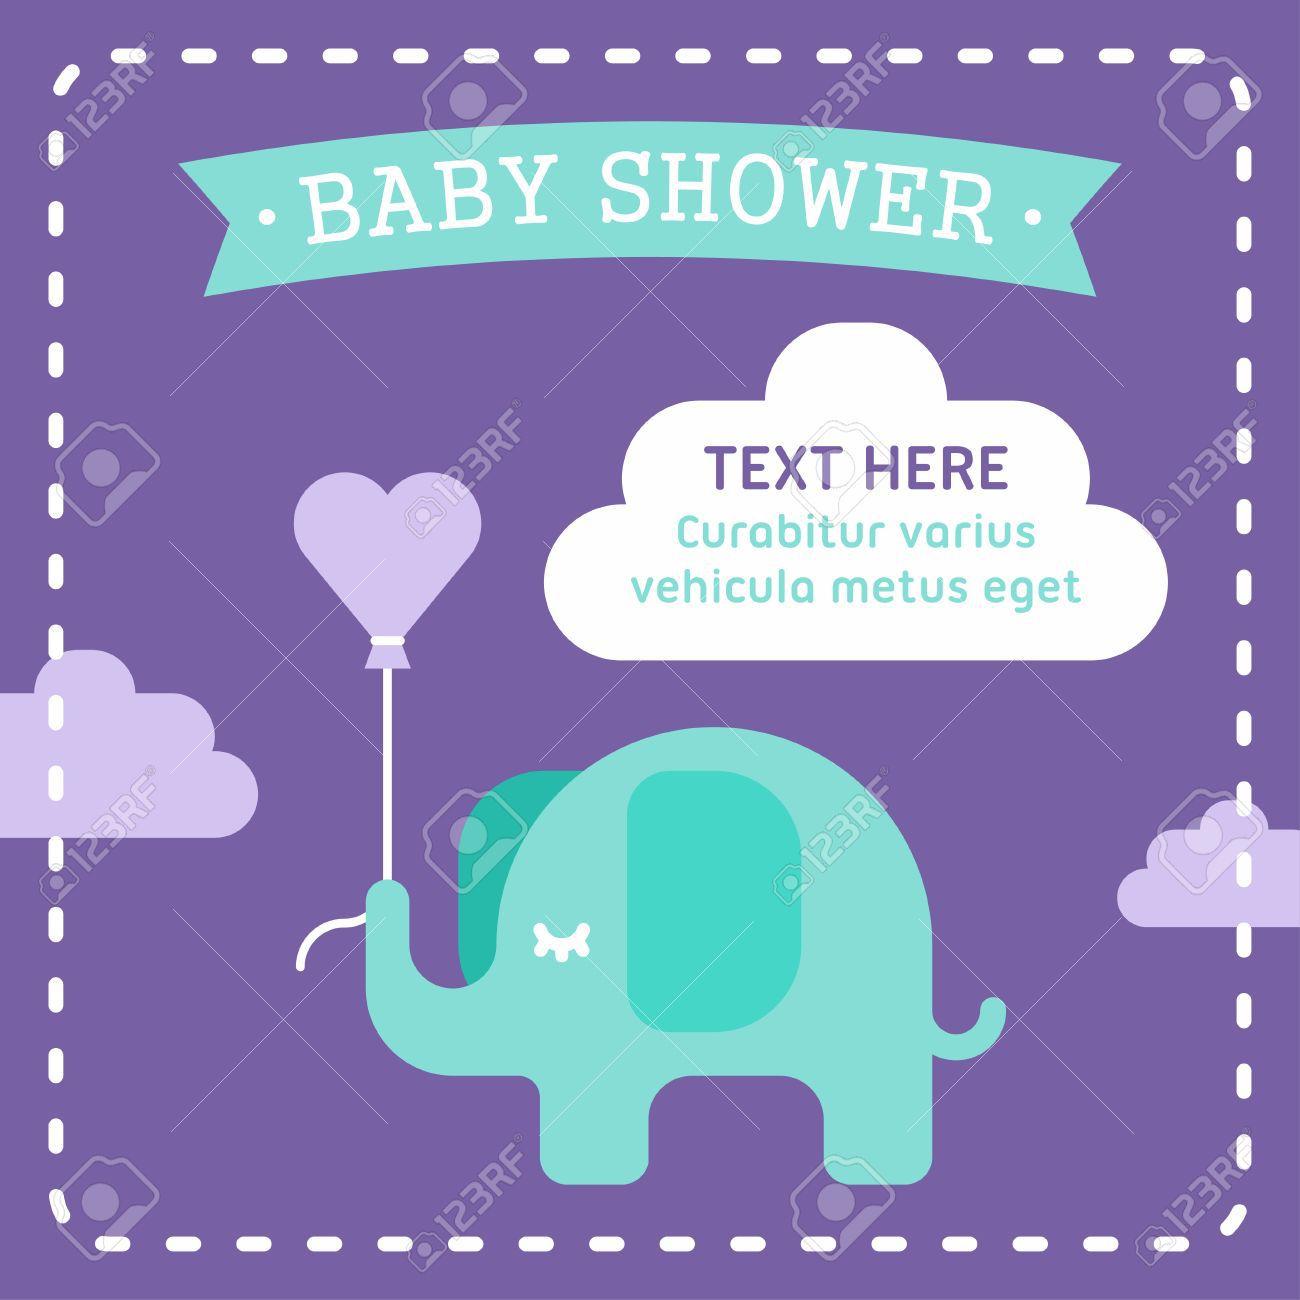 004 Shocking Elephant Girl Baby Shower Invitation Template High Resolution  Templates PinkFull